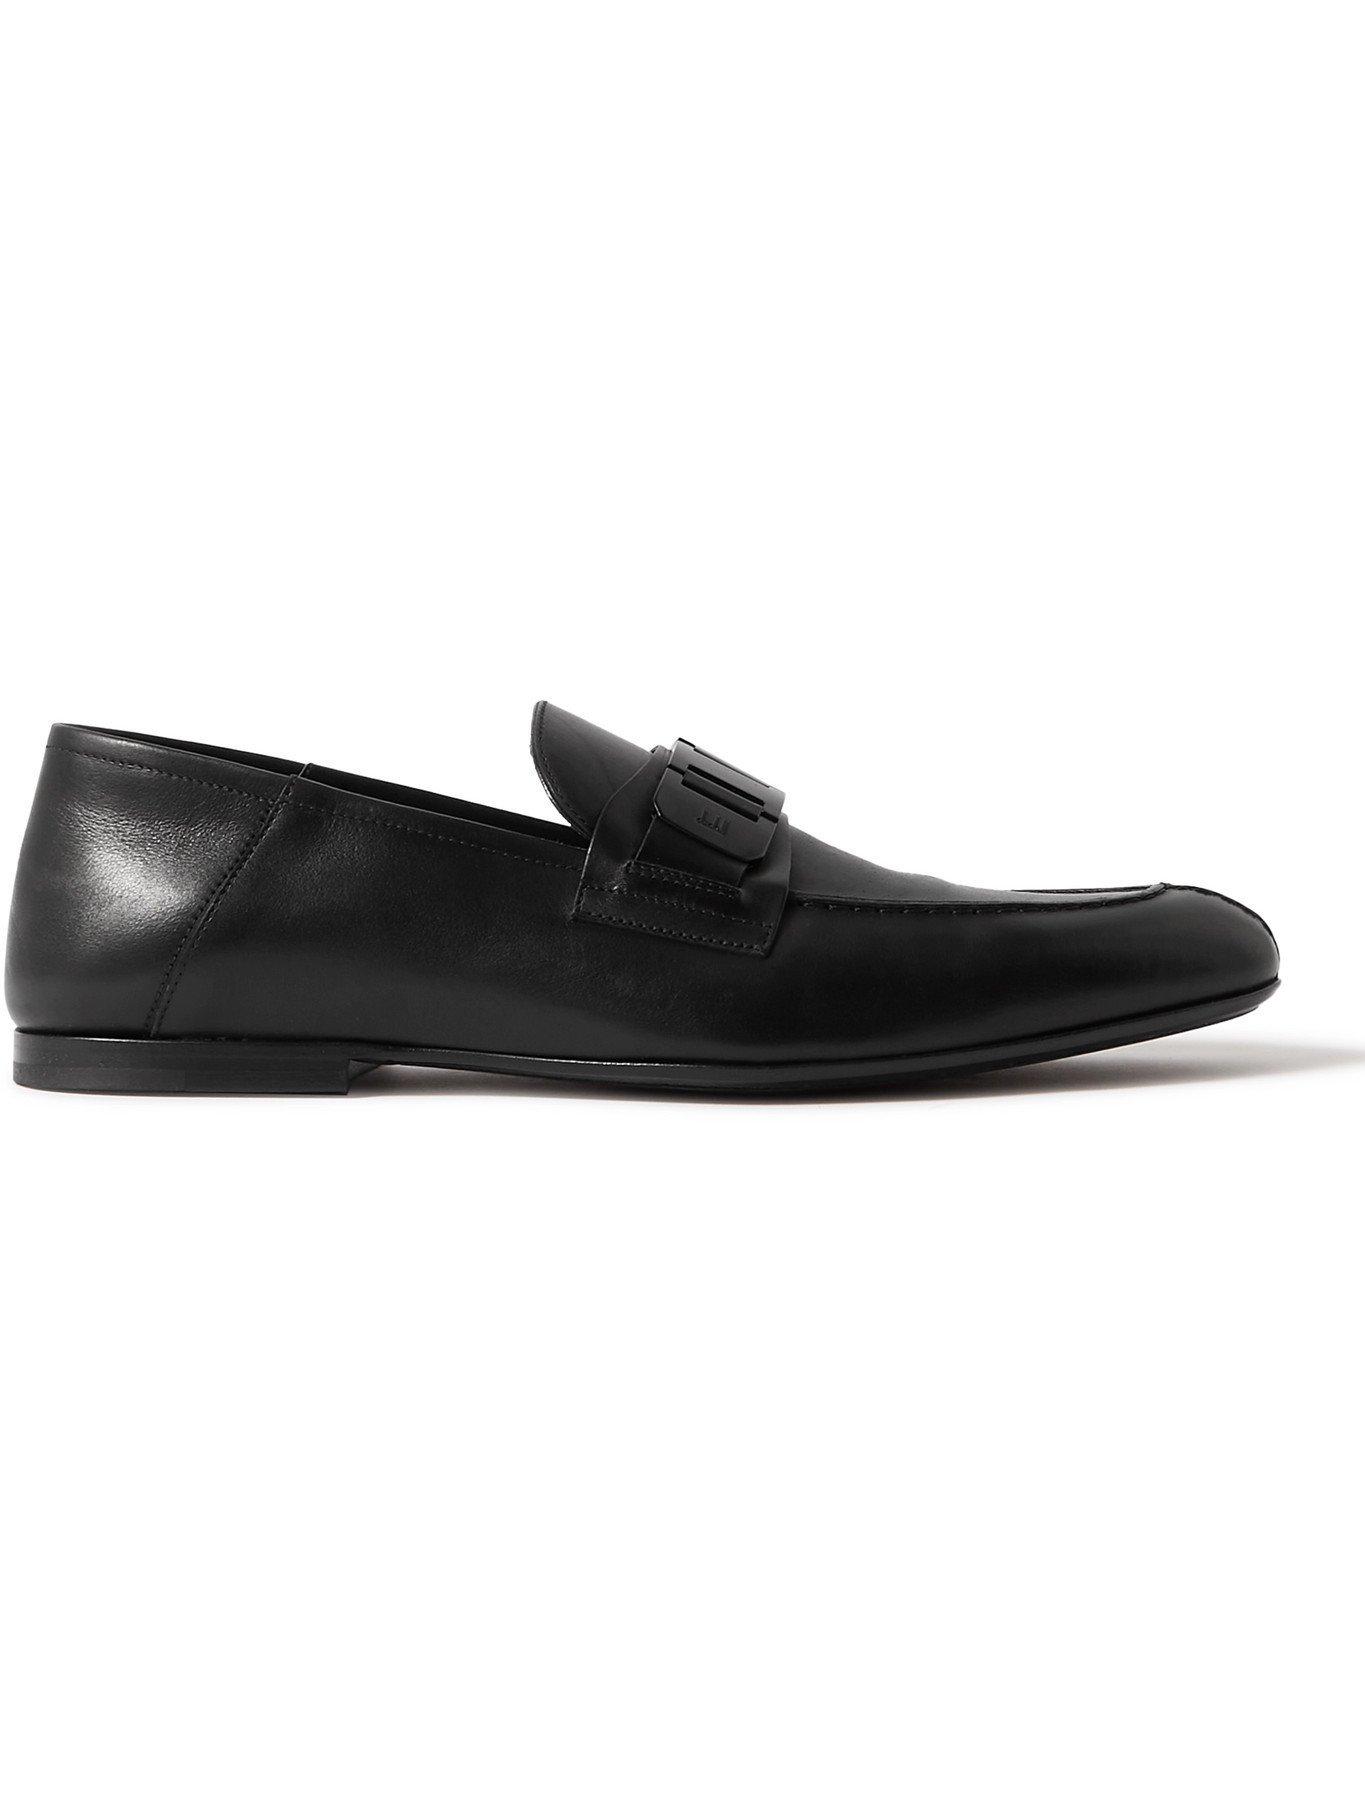 DUNHILL - Link Chain-Embellished Brushed-Leather Loafers - Black